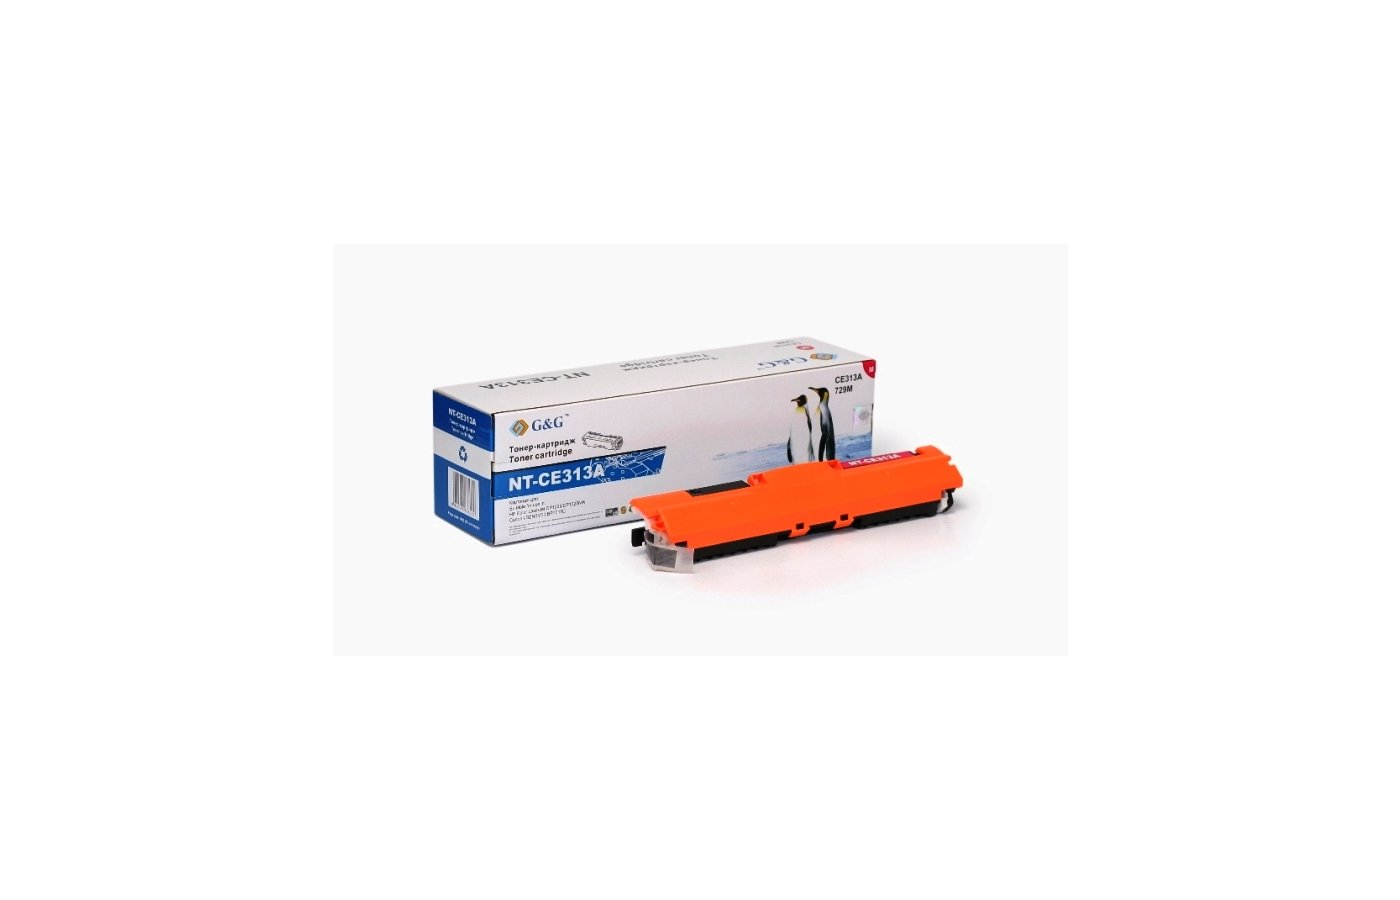 Картридж лазерный GG NT-CE313A Совместимый пурпурный для HP Color LaserJet CP1025/1025nw, Canon LBP-7010C 1000стр